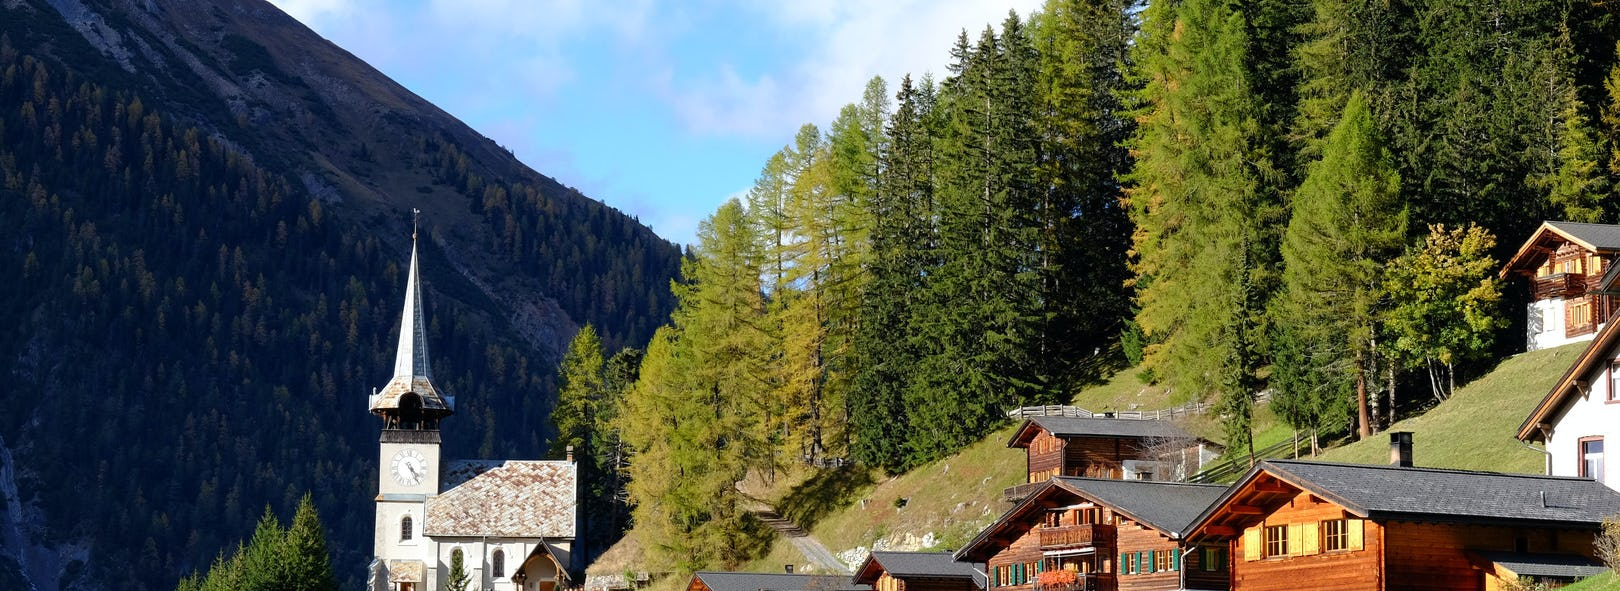 Monstein Davos Klosters Marcel Giger